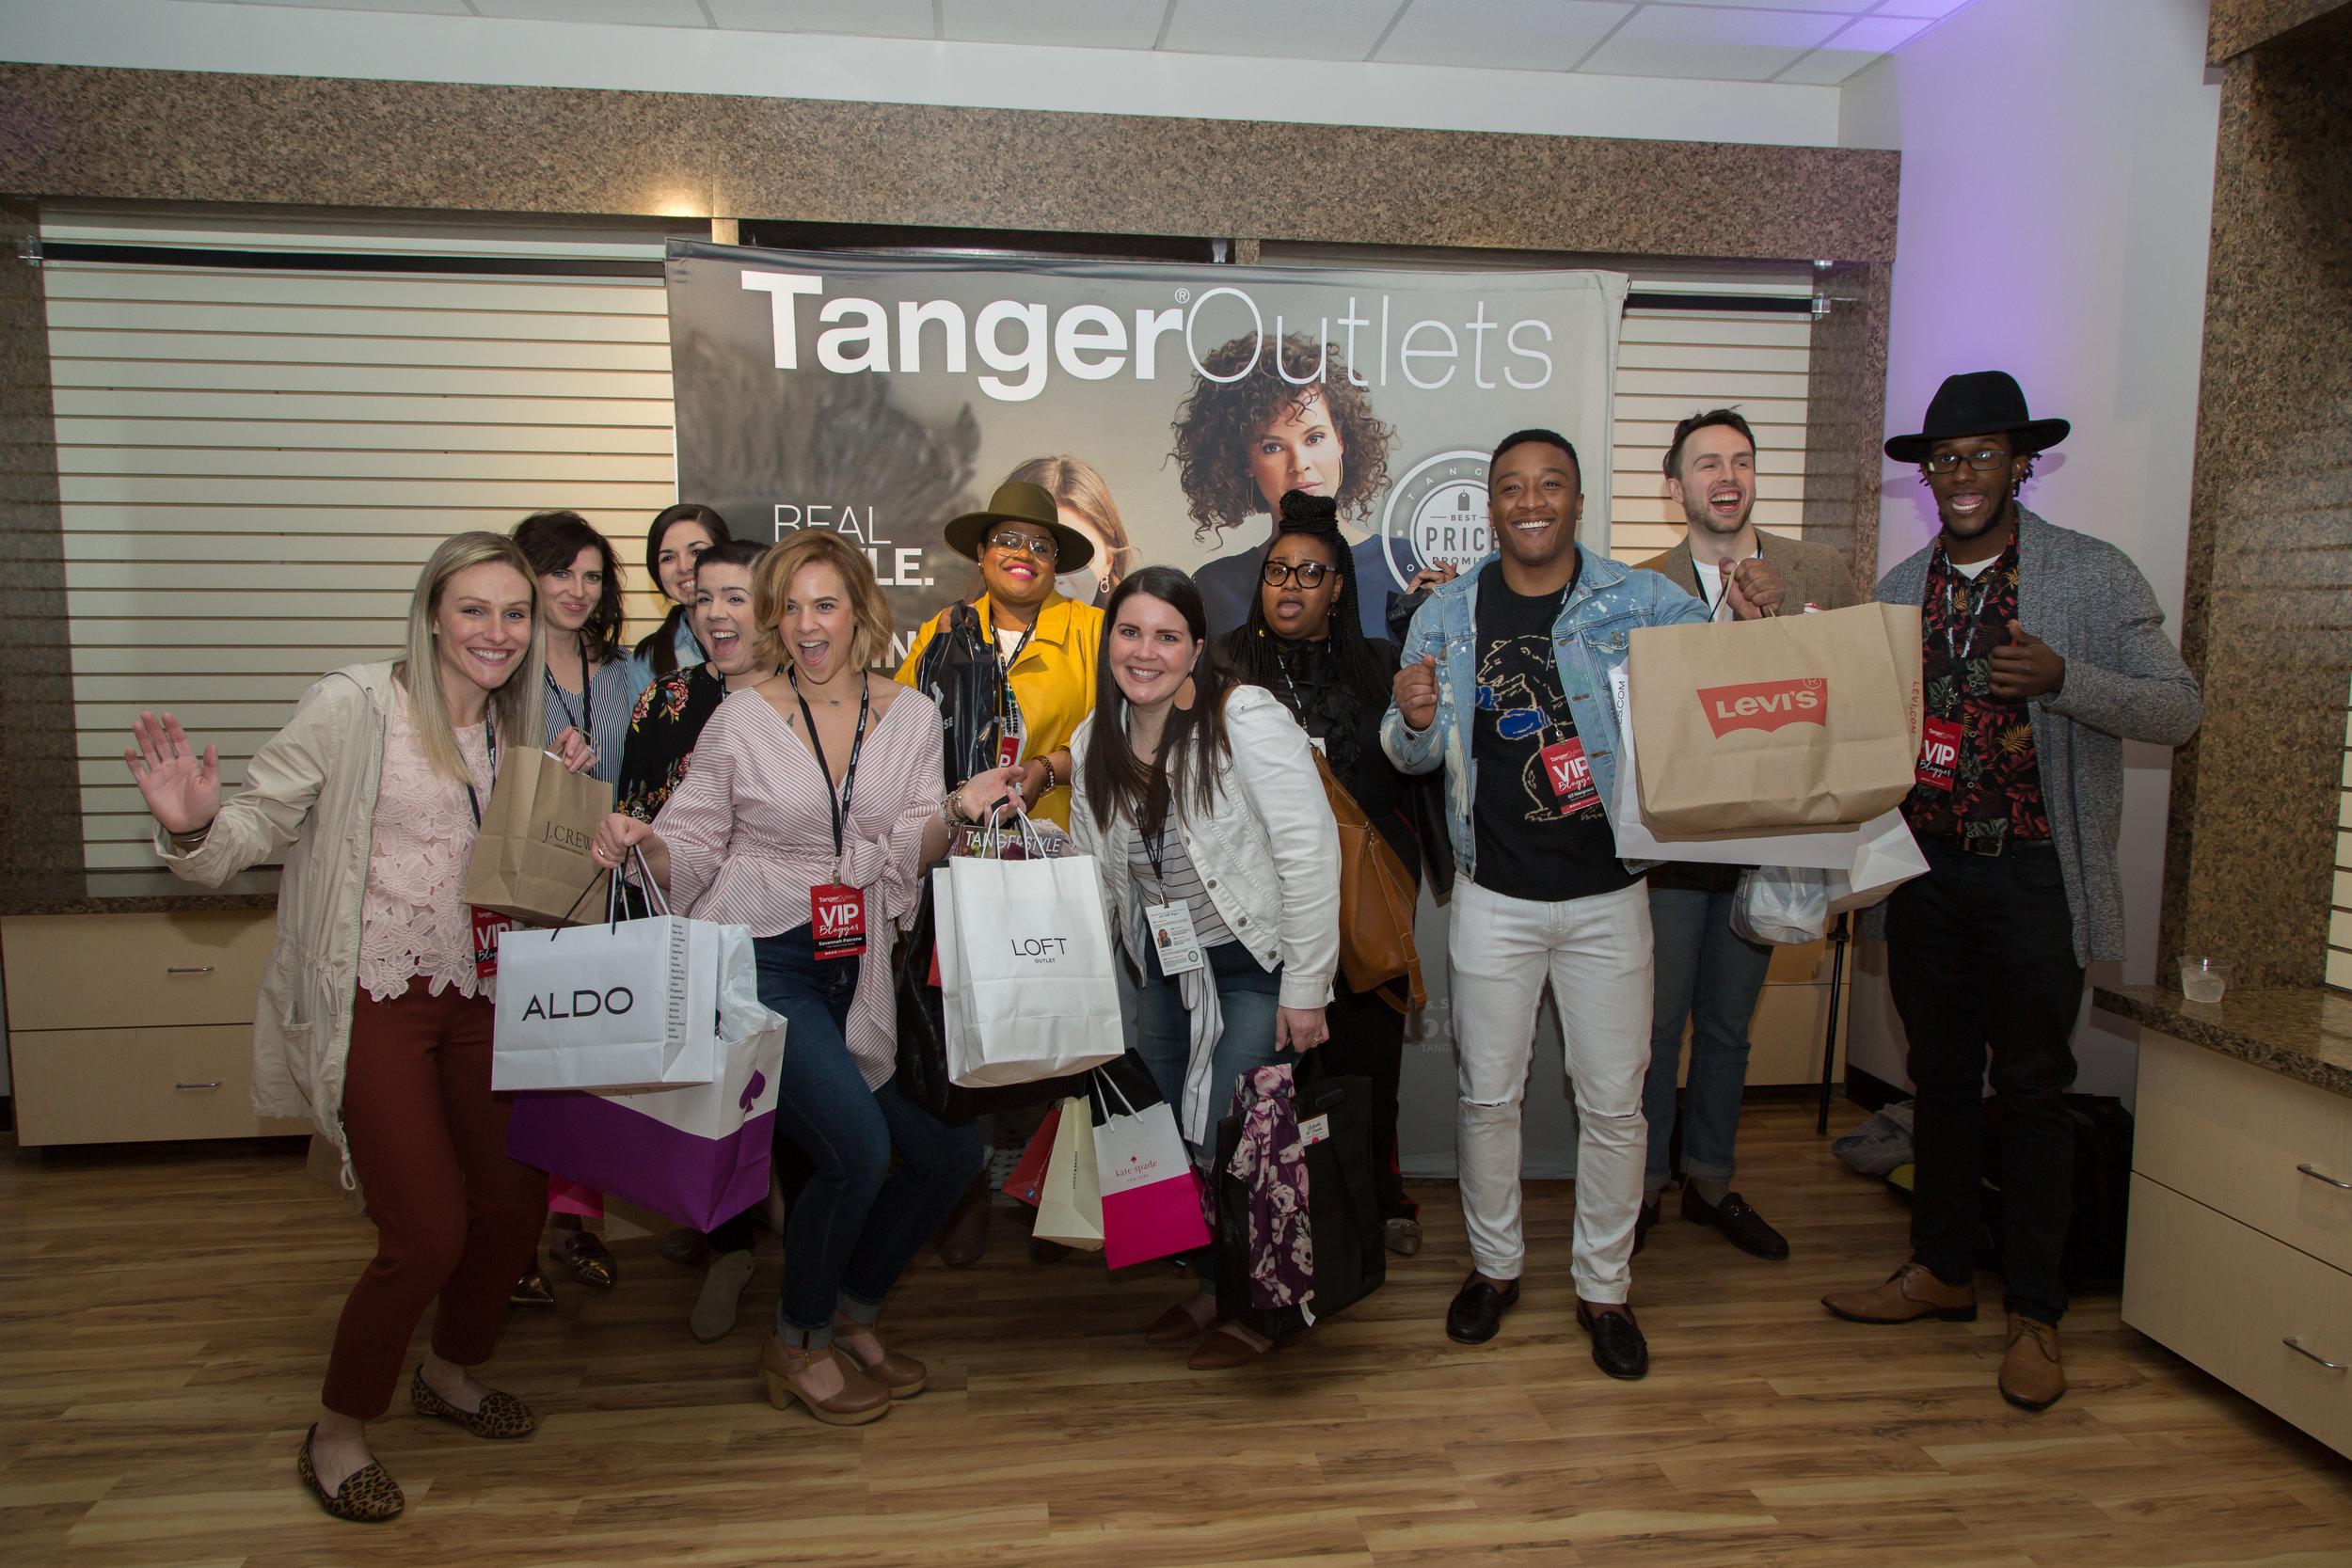 dj-hargrave-blogger-tanger-outlets.jpg